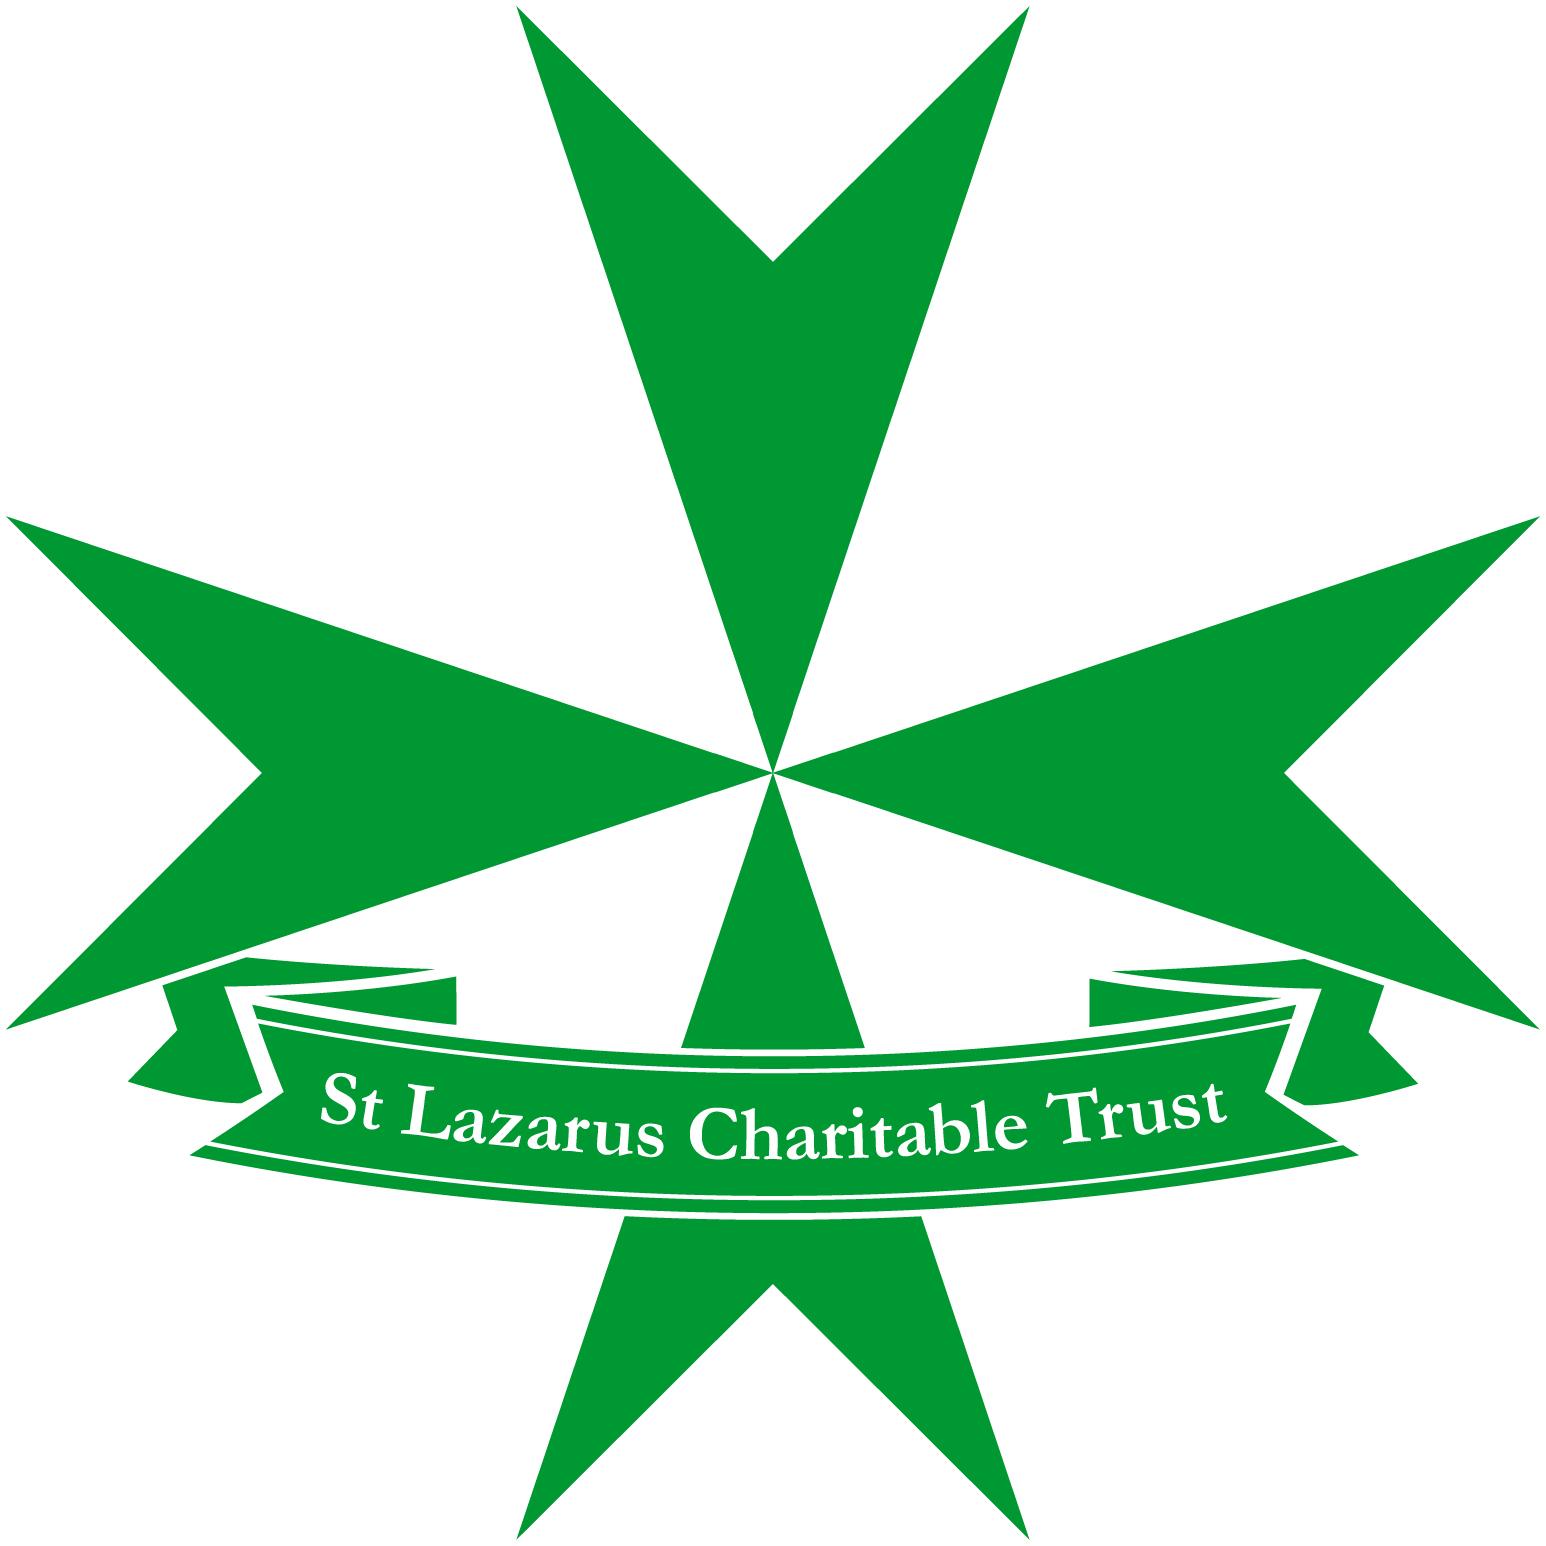 St Lazarus Charitable Trust Logo